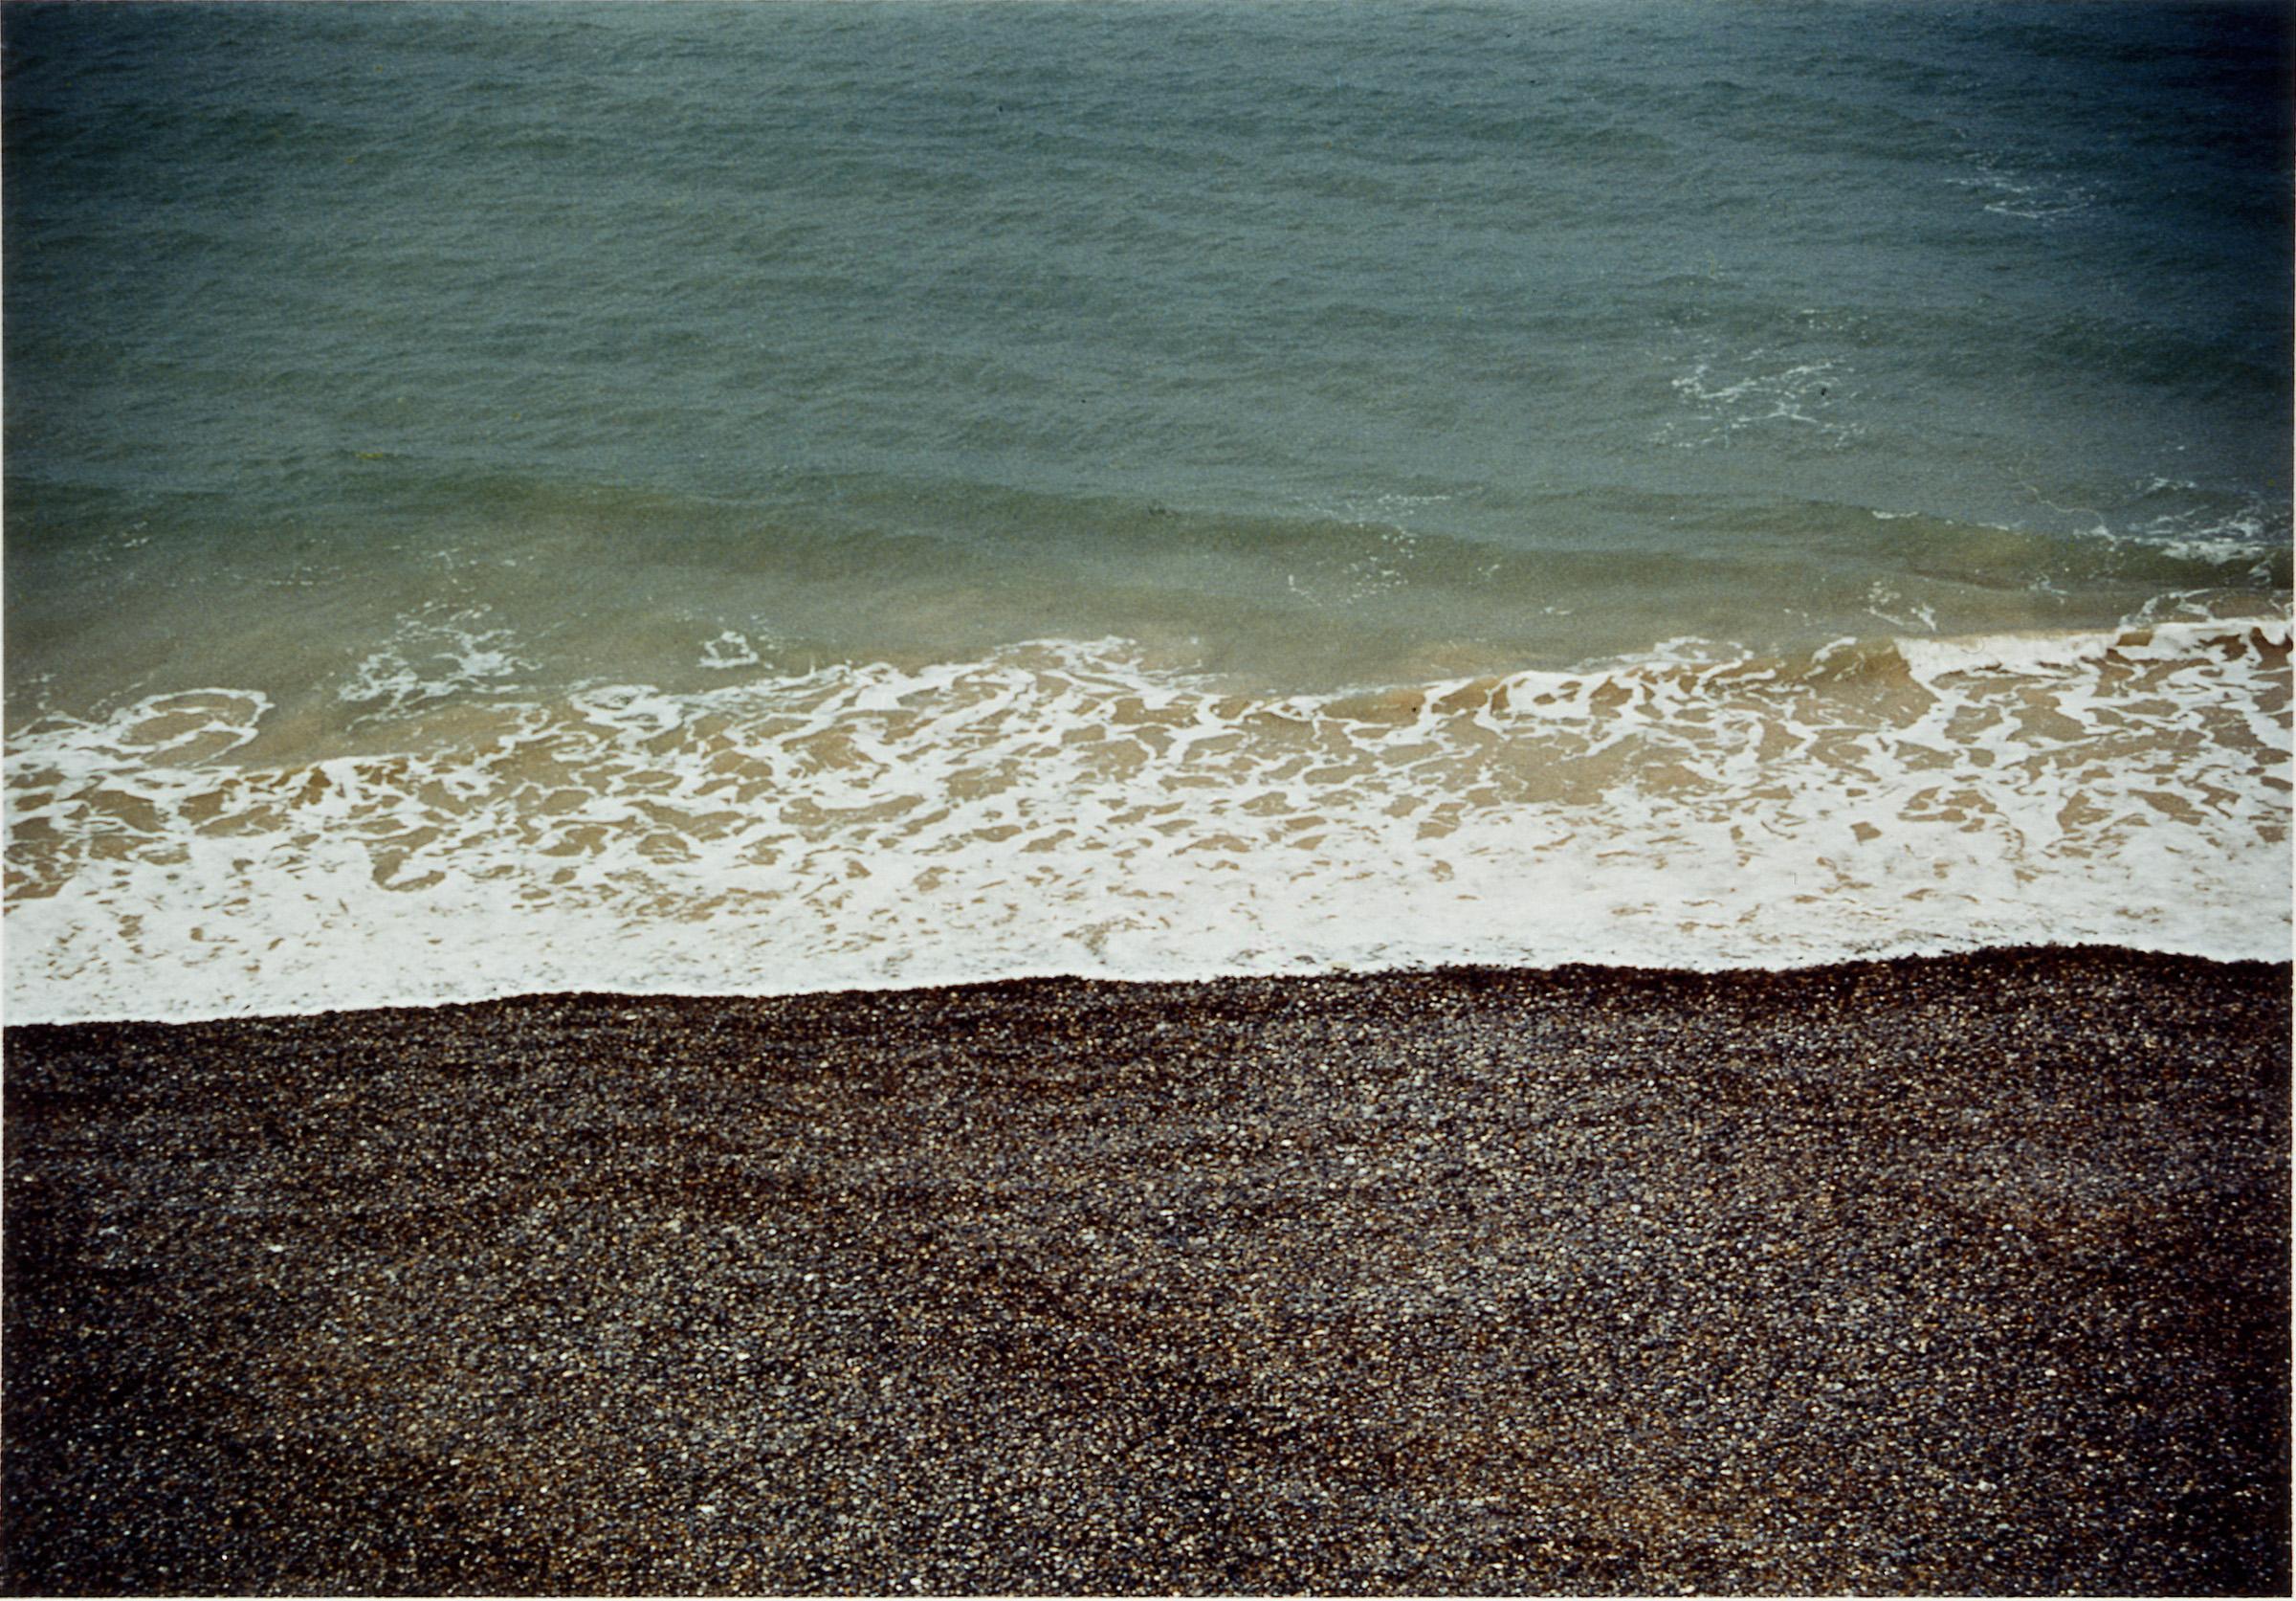 Landline by Sean Scully